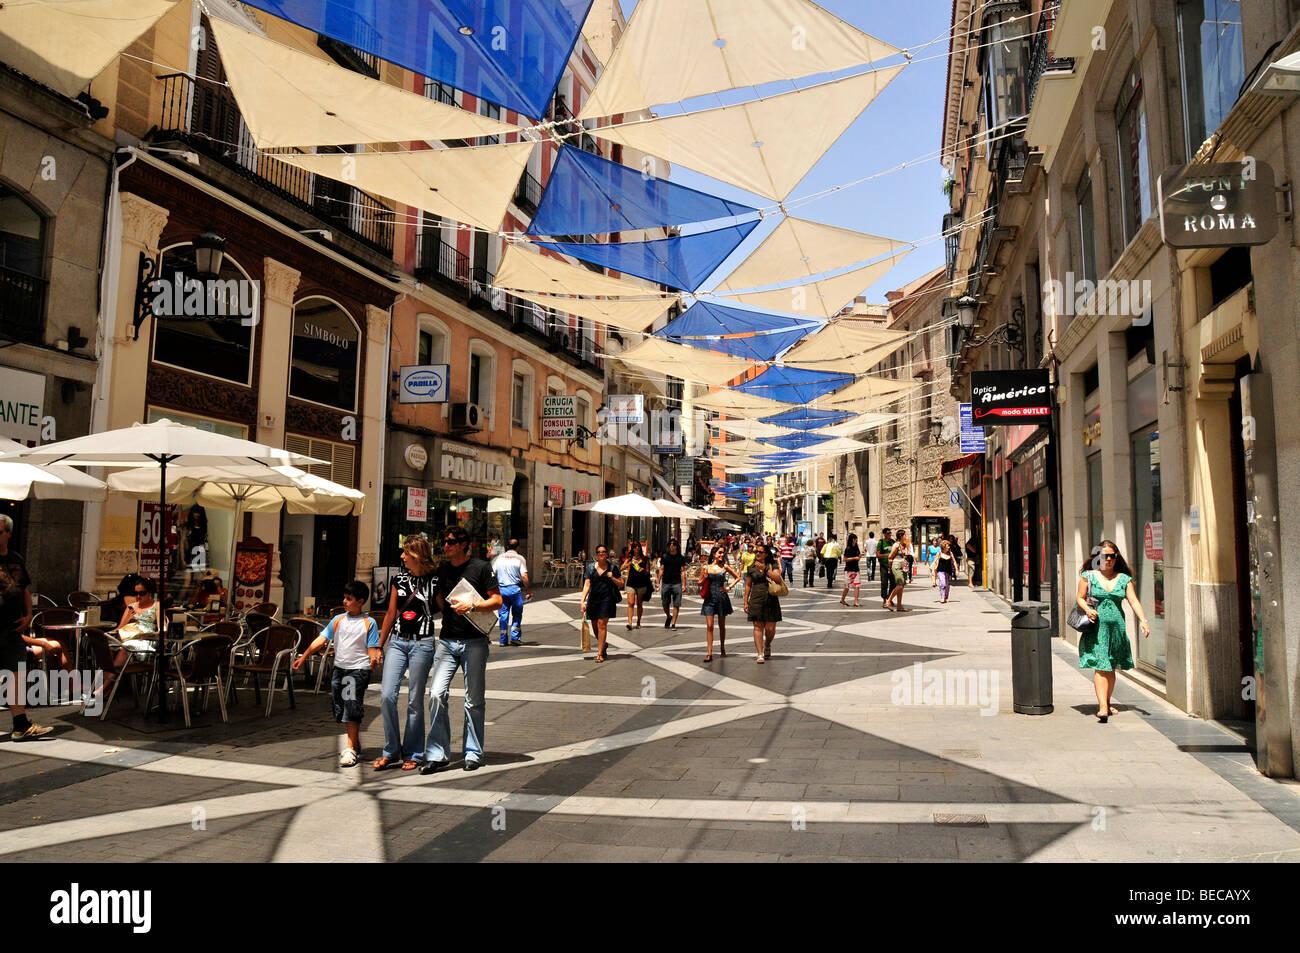 Einkaufsstraße Calle del Carmen, Madrid, Spanien, Iberische Halbinsel, Europa Stockbild